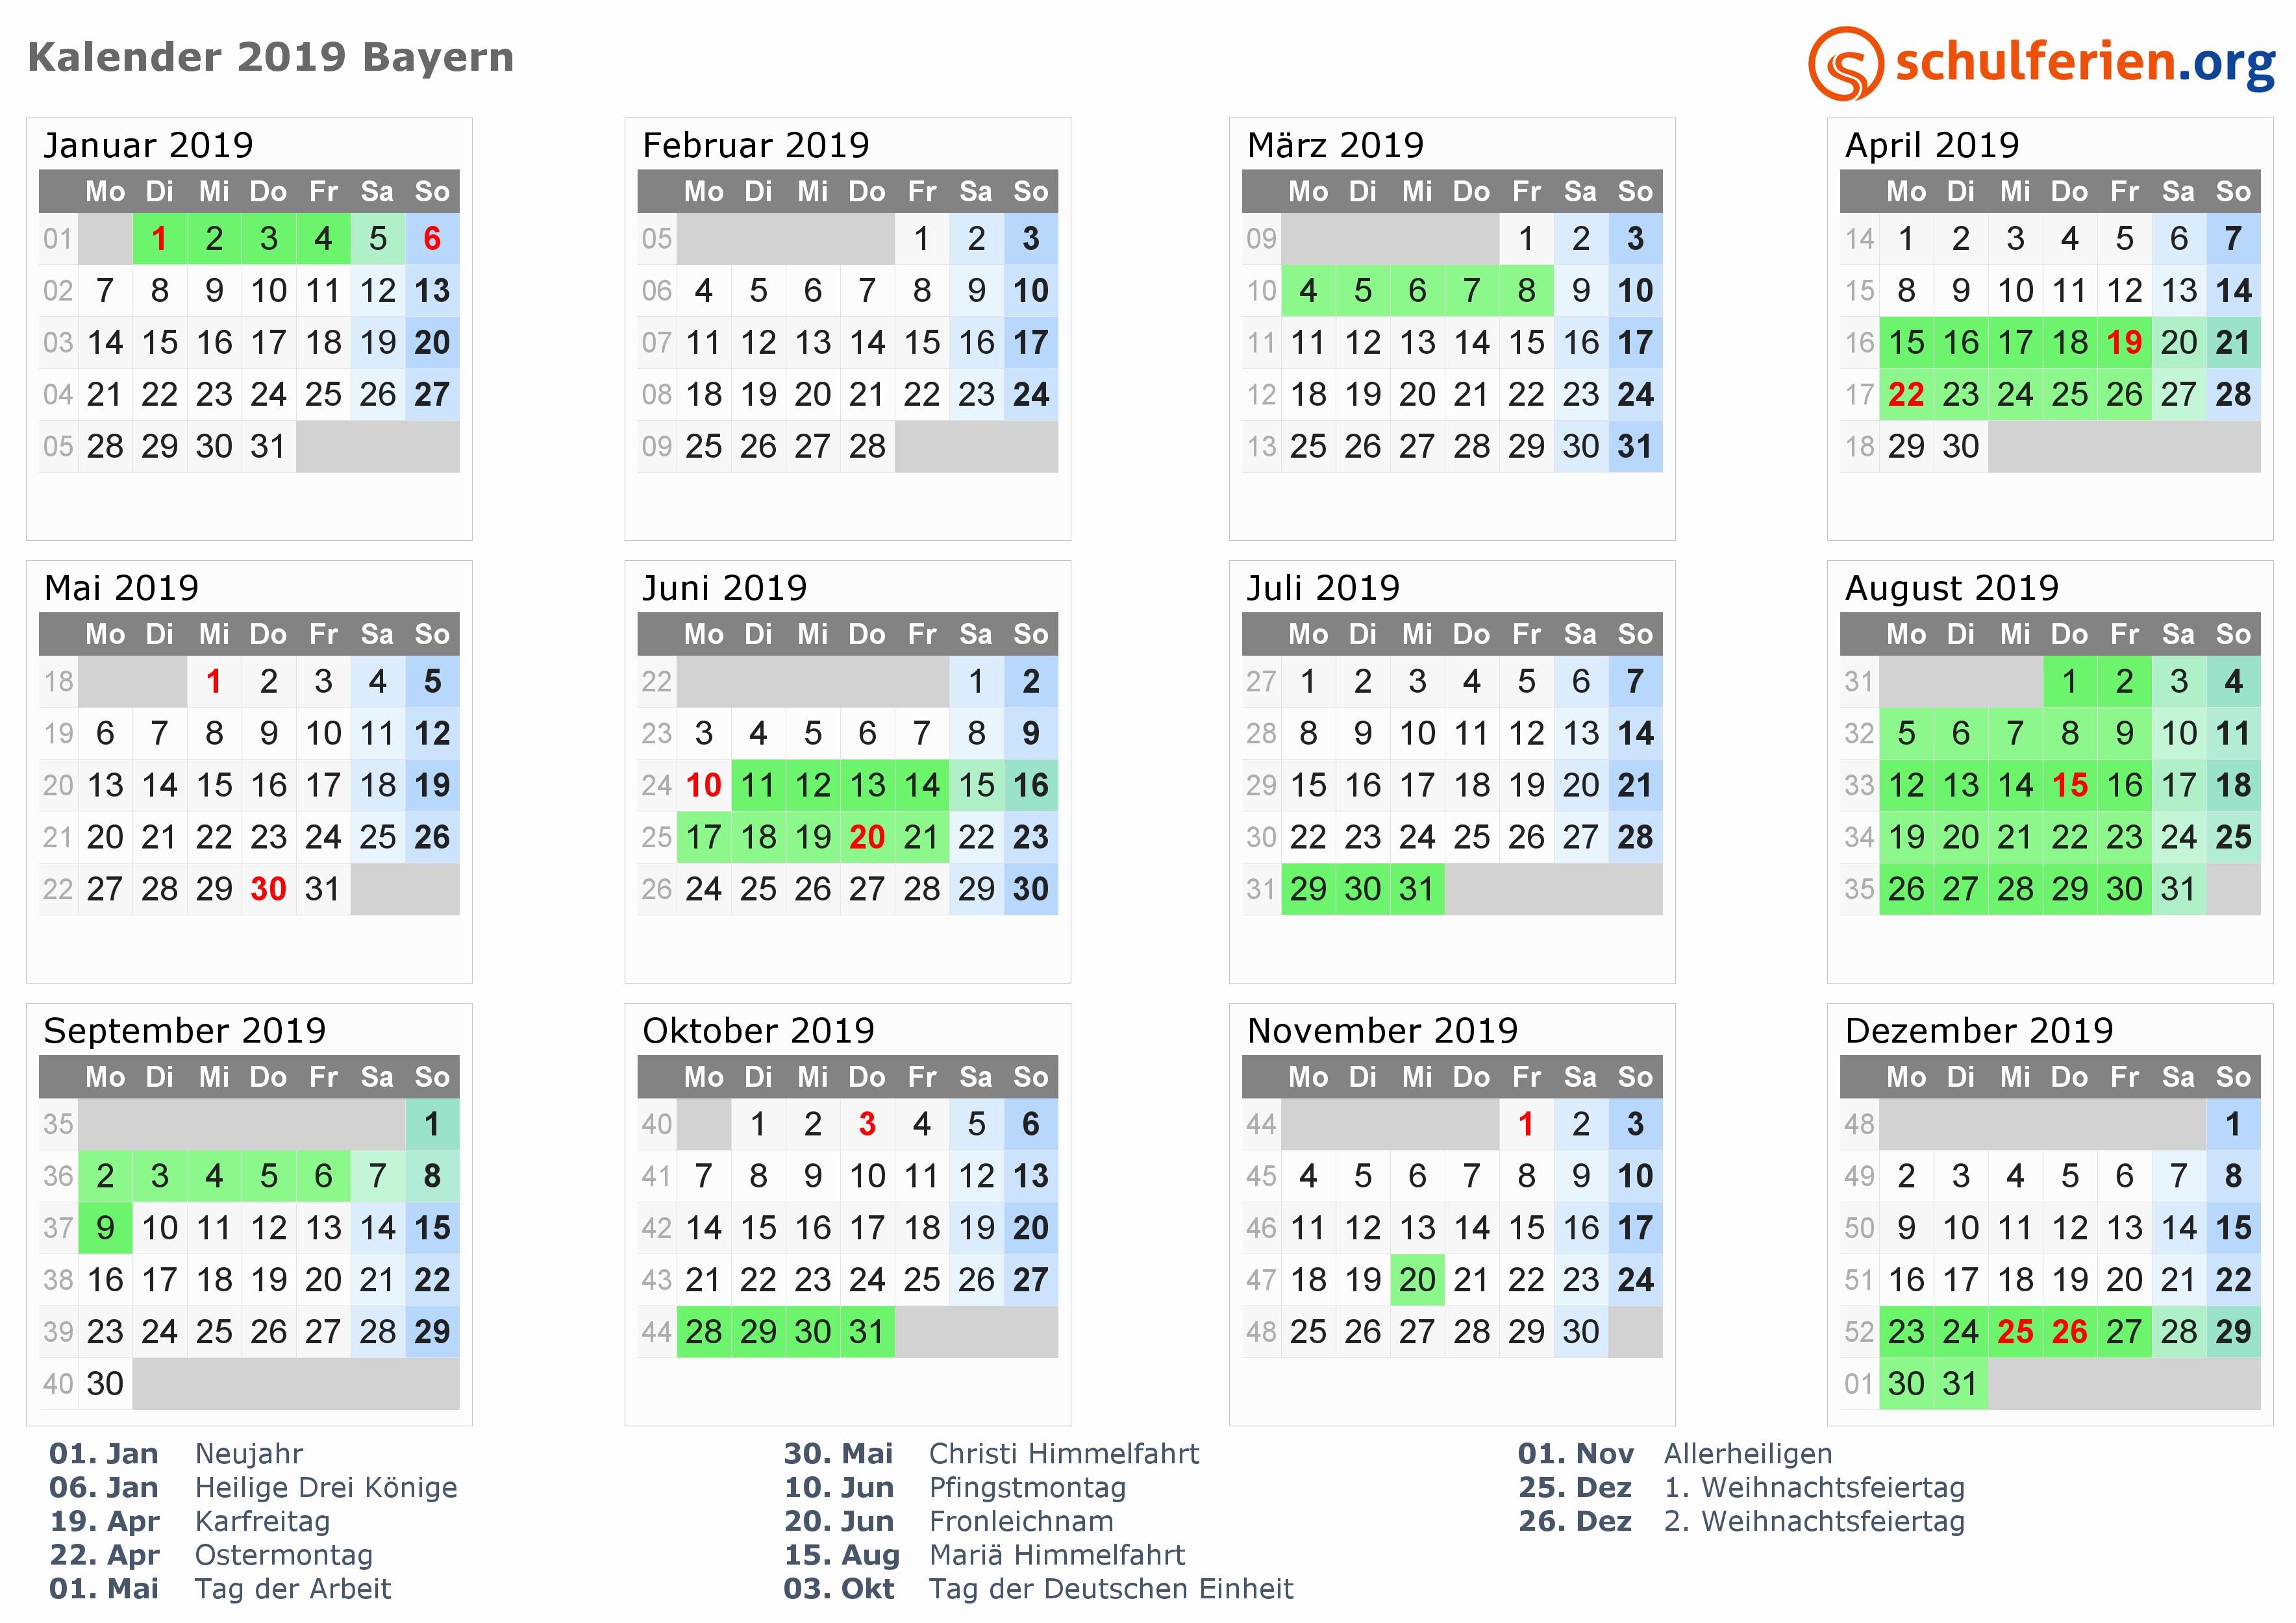 Kalender 2019 Pdf A3 Actual Kalender Ferien Bayern 2019 2020 Pdf Kalender 2019 Indonesia Ferien Of Kalender 2019 Pdf A3 Mejores Y Más Novedosos Kalender 2016 A4 Quer